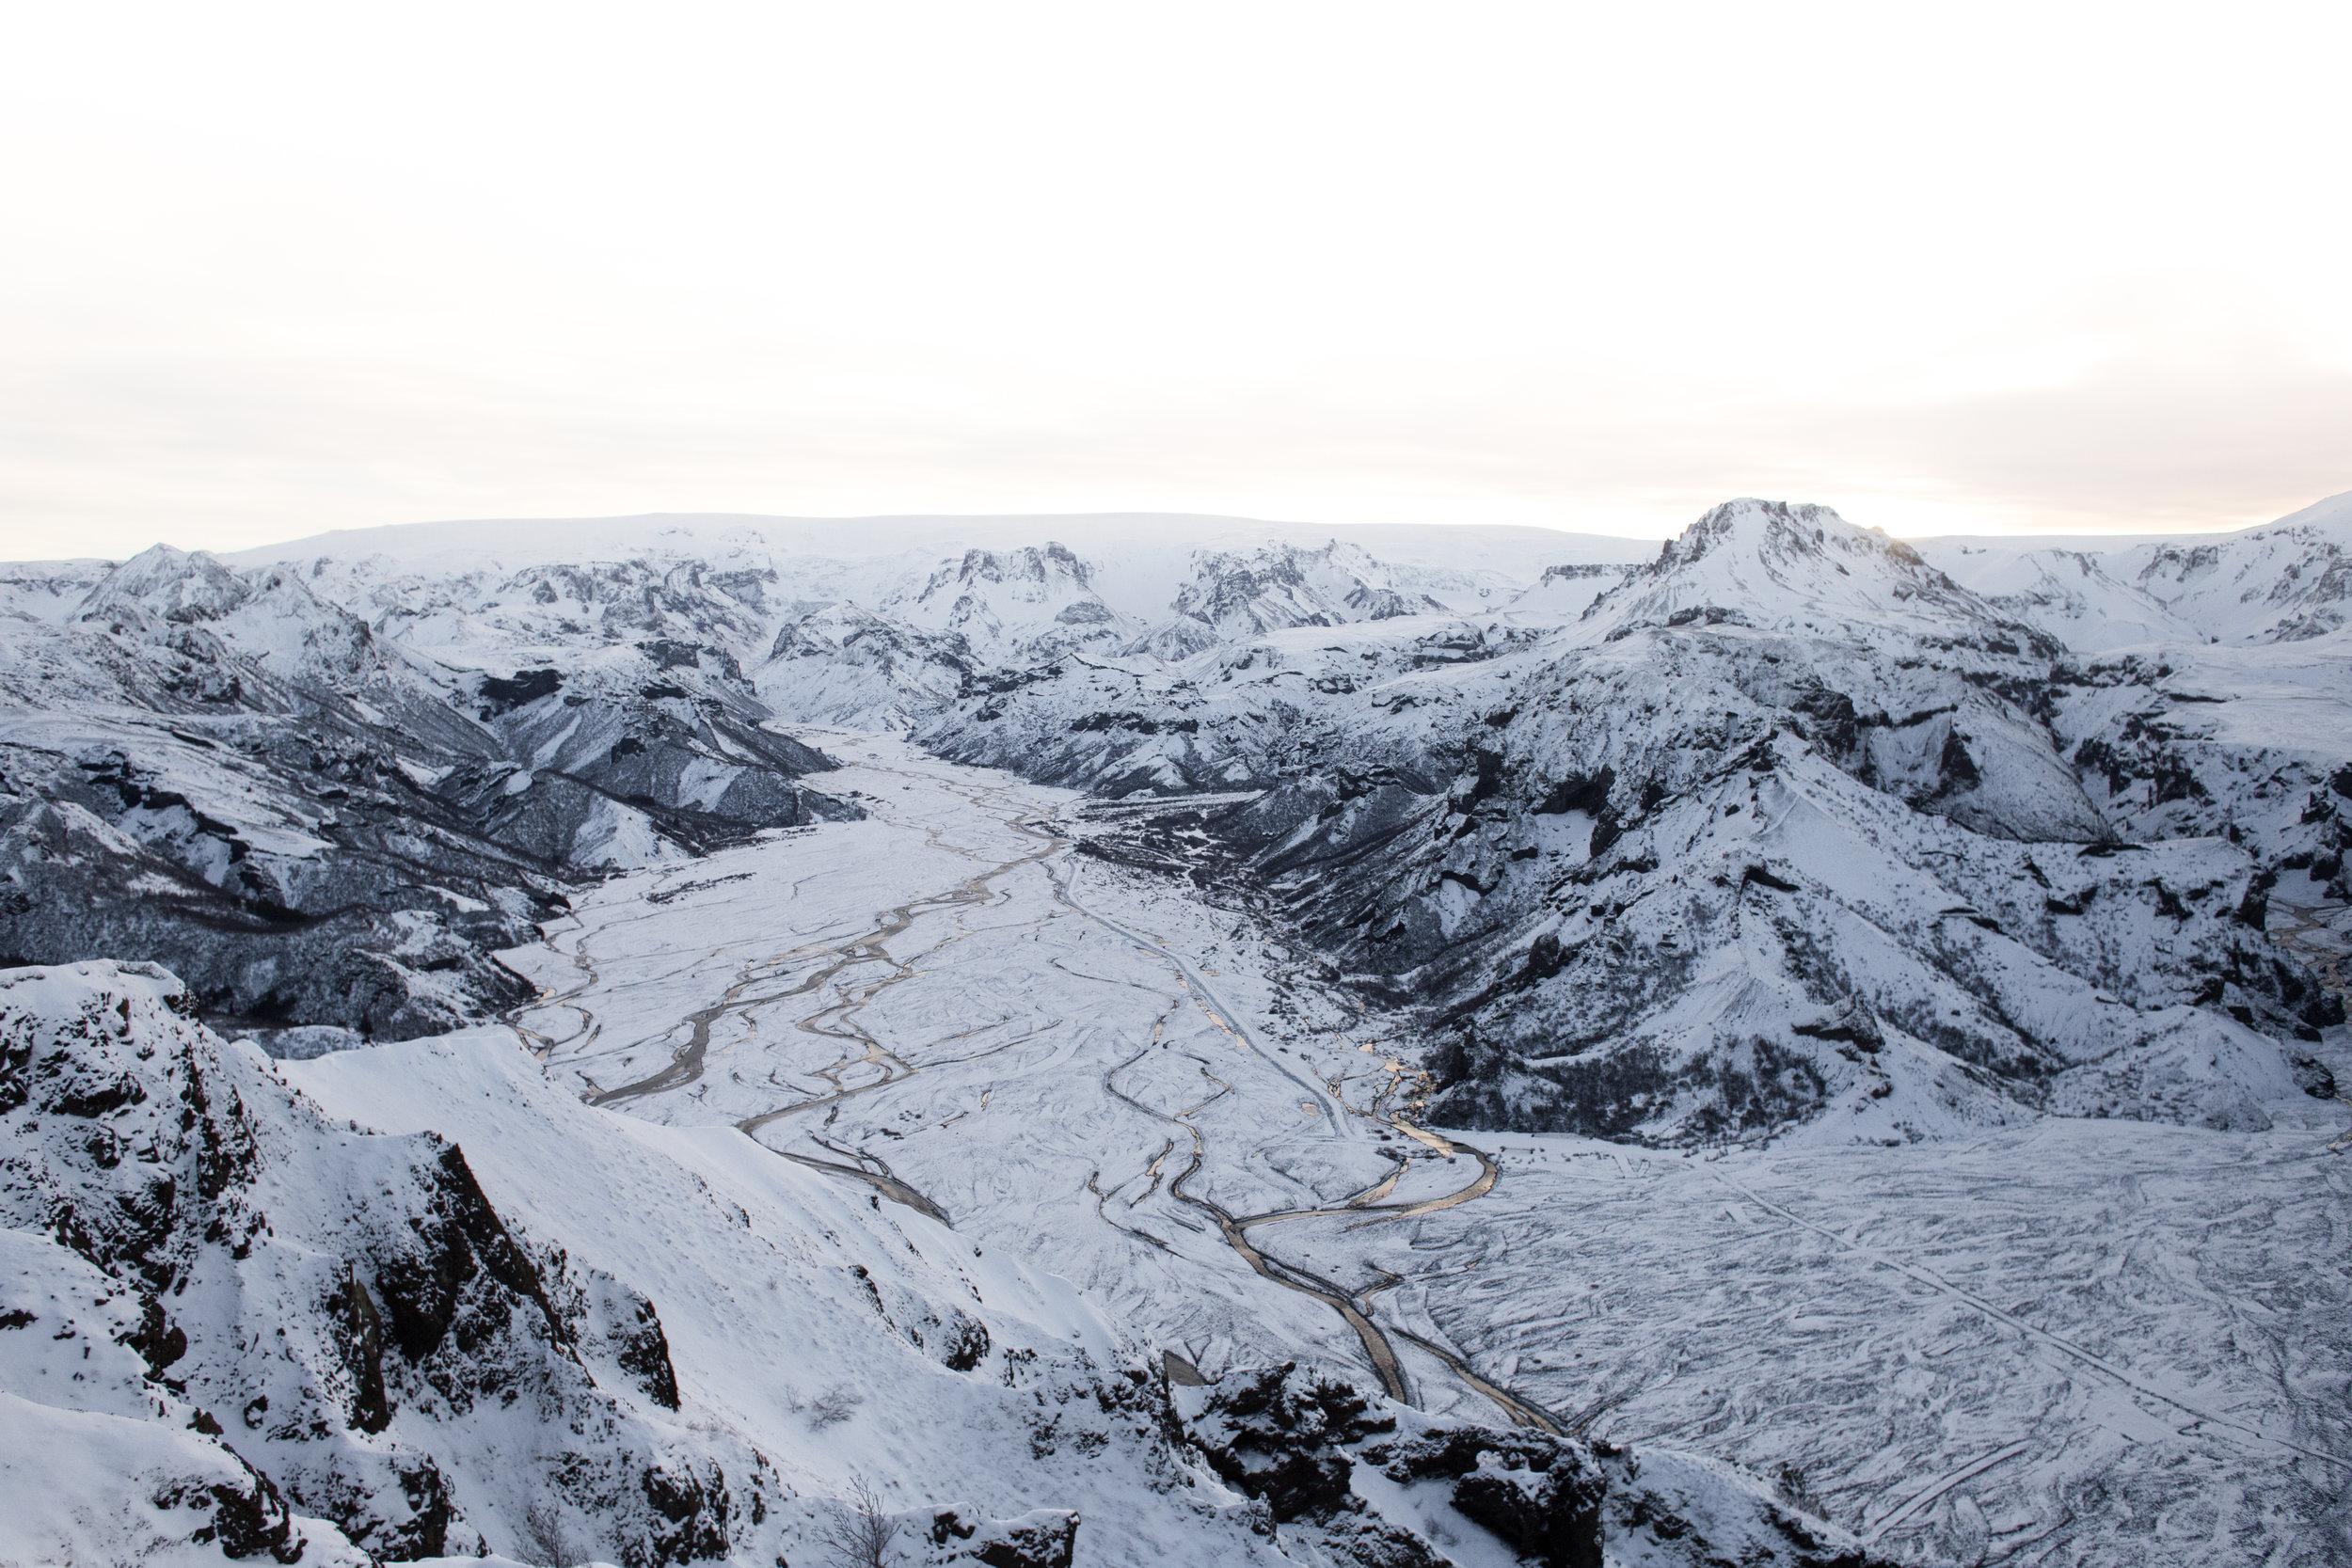 jermiah-schuster-iceland-209.jpg